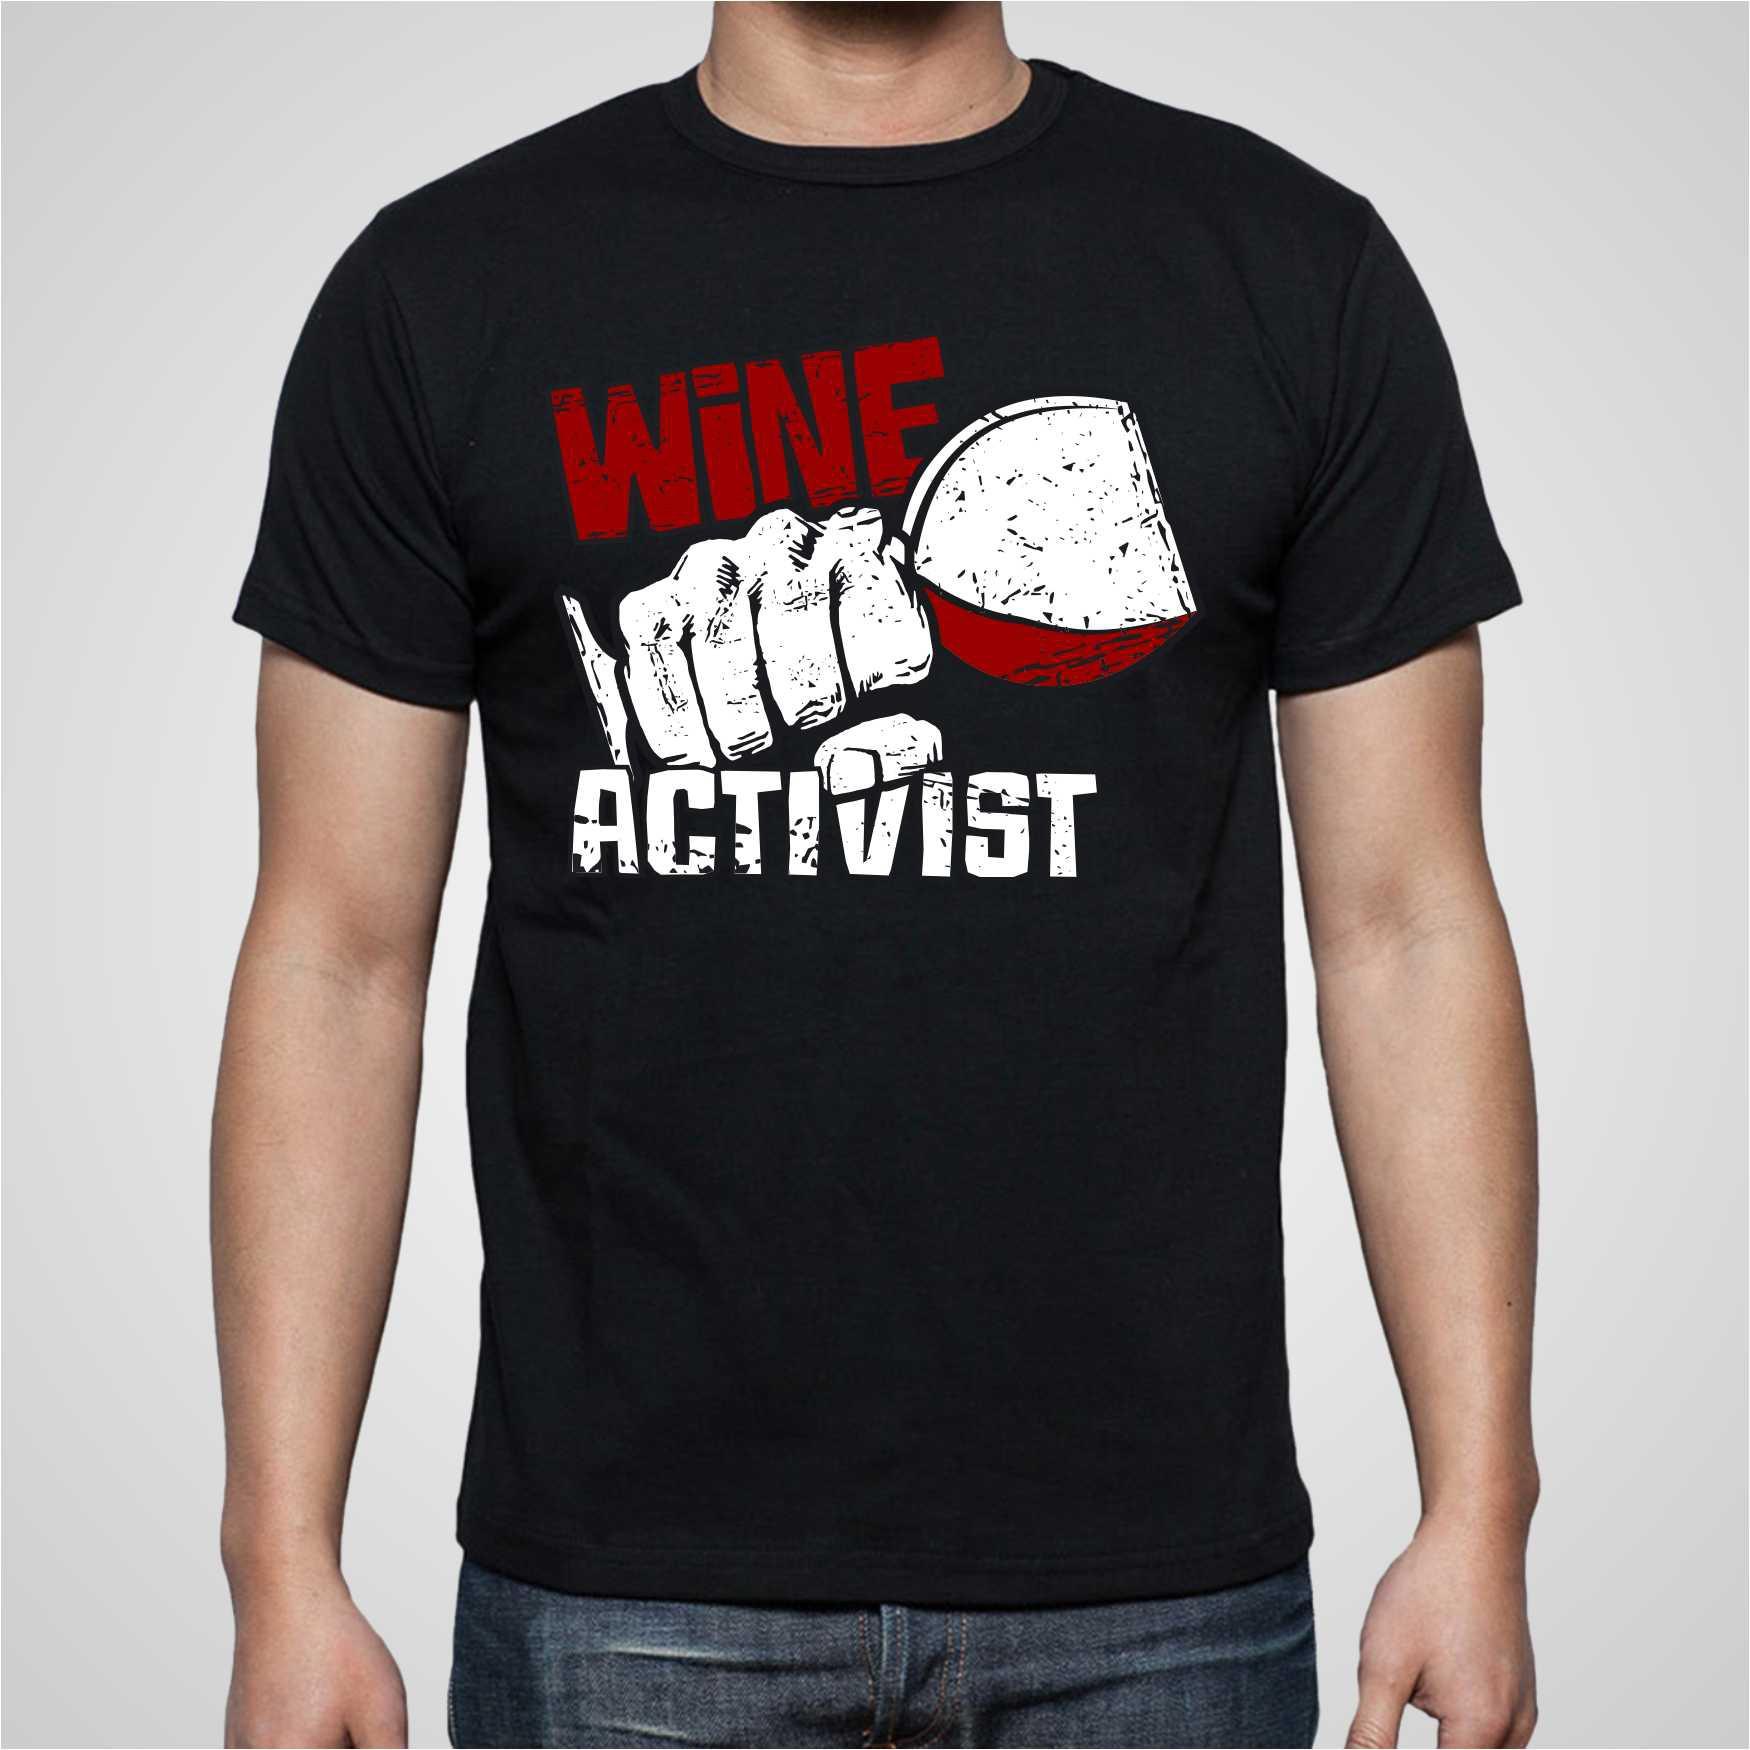 Wine Activist T-Shirt Design